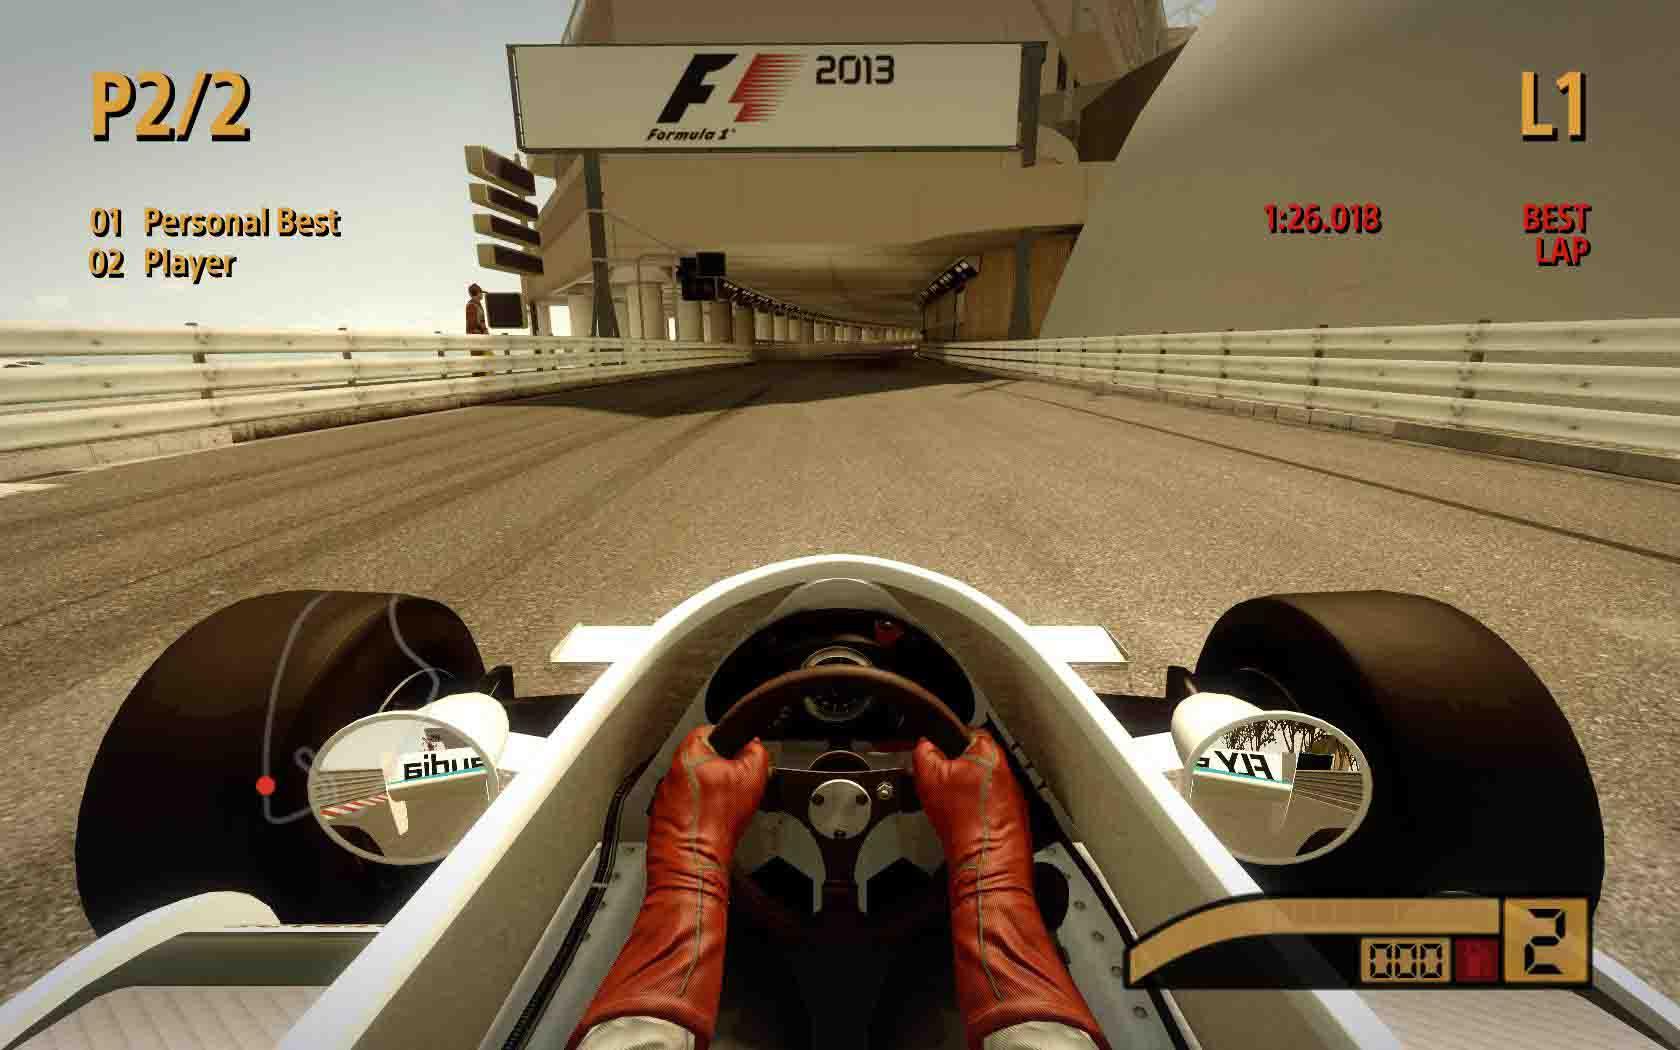 F1_2013 2013-11-05 05-52-10-70 copy.jpg